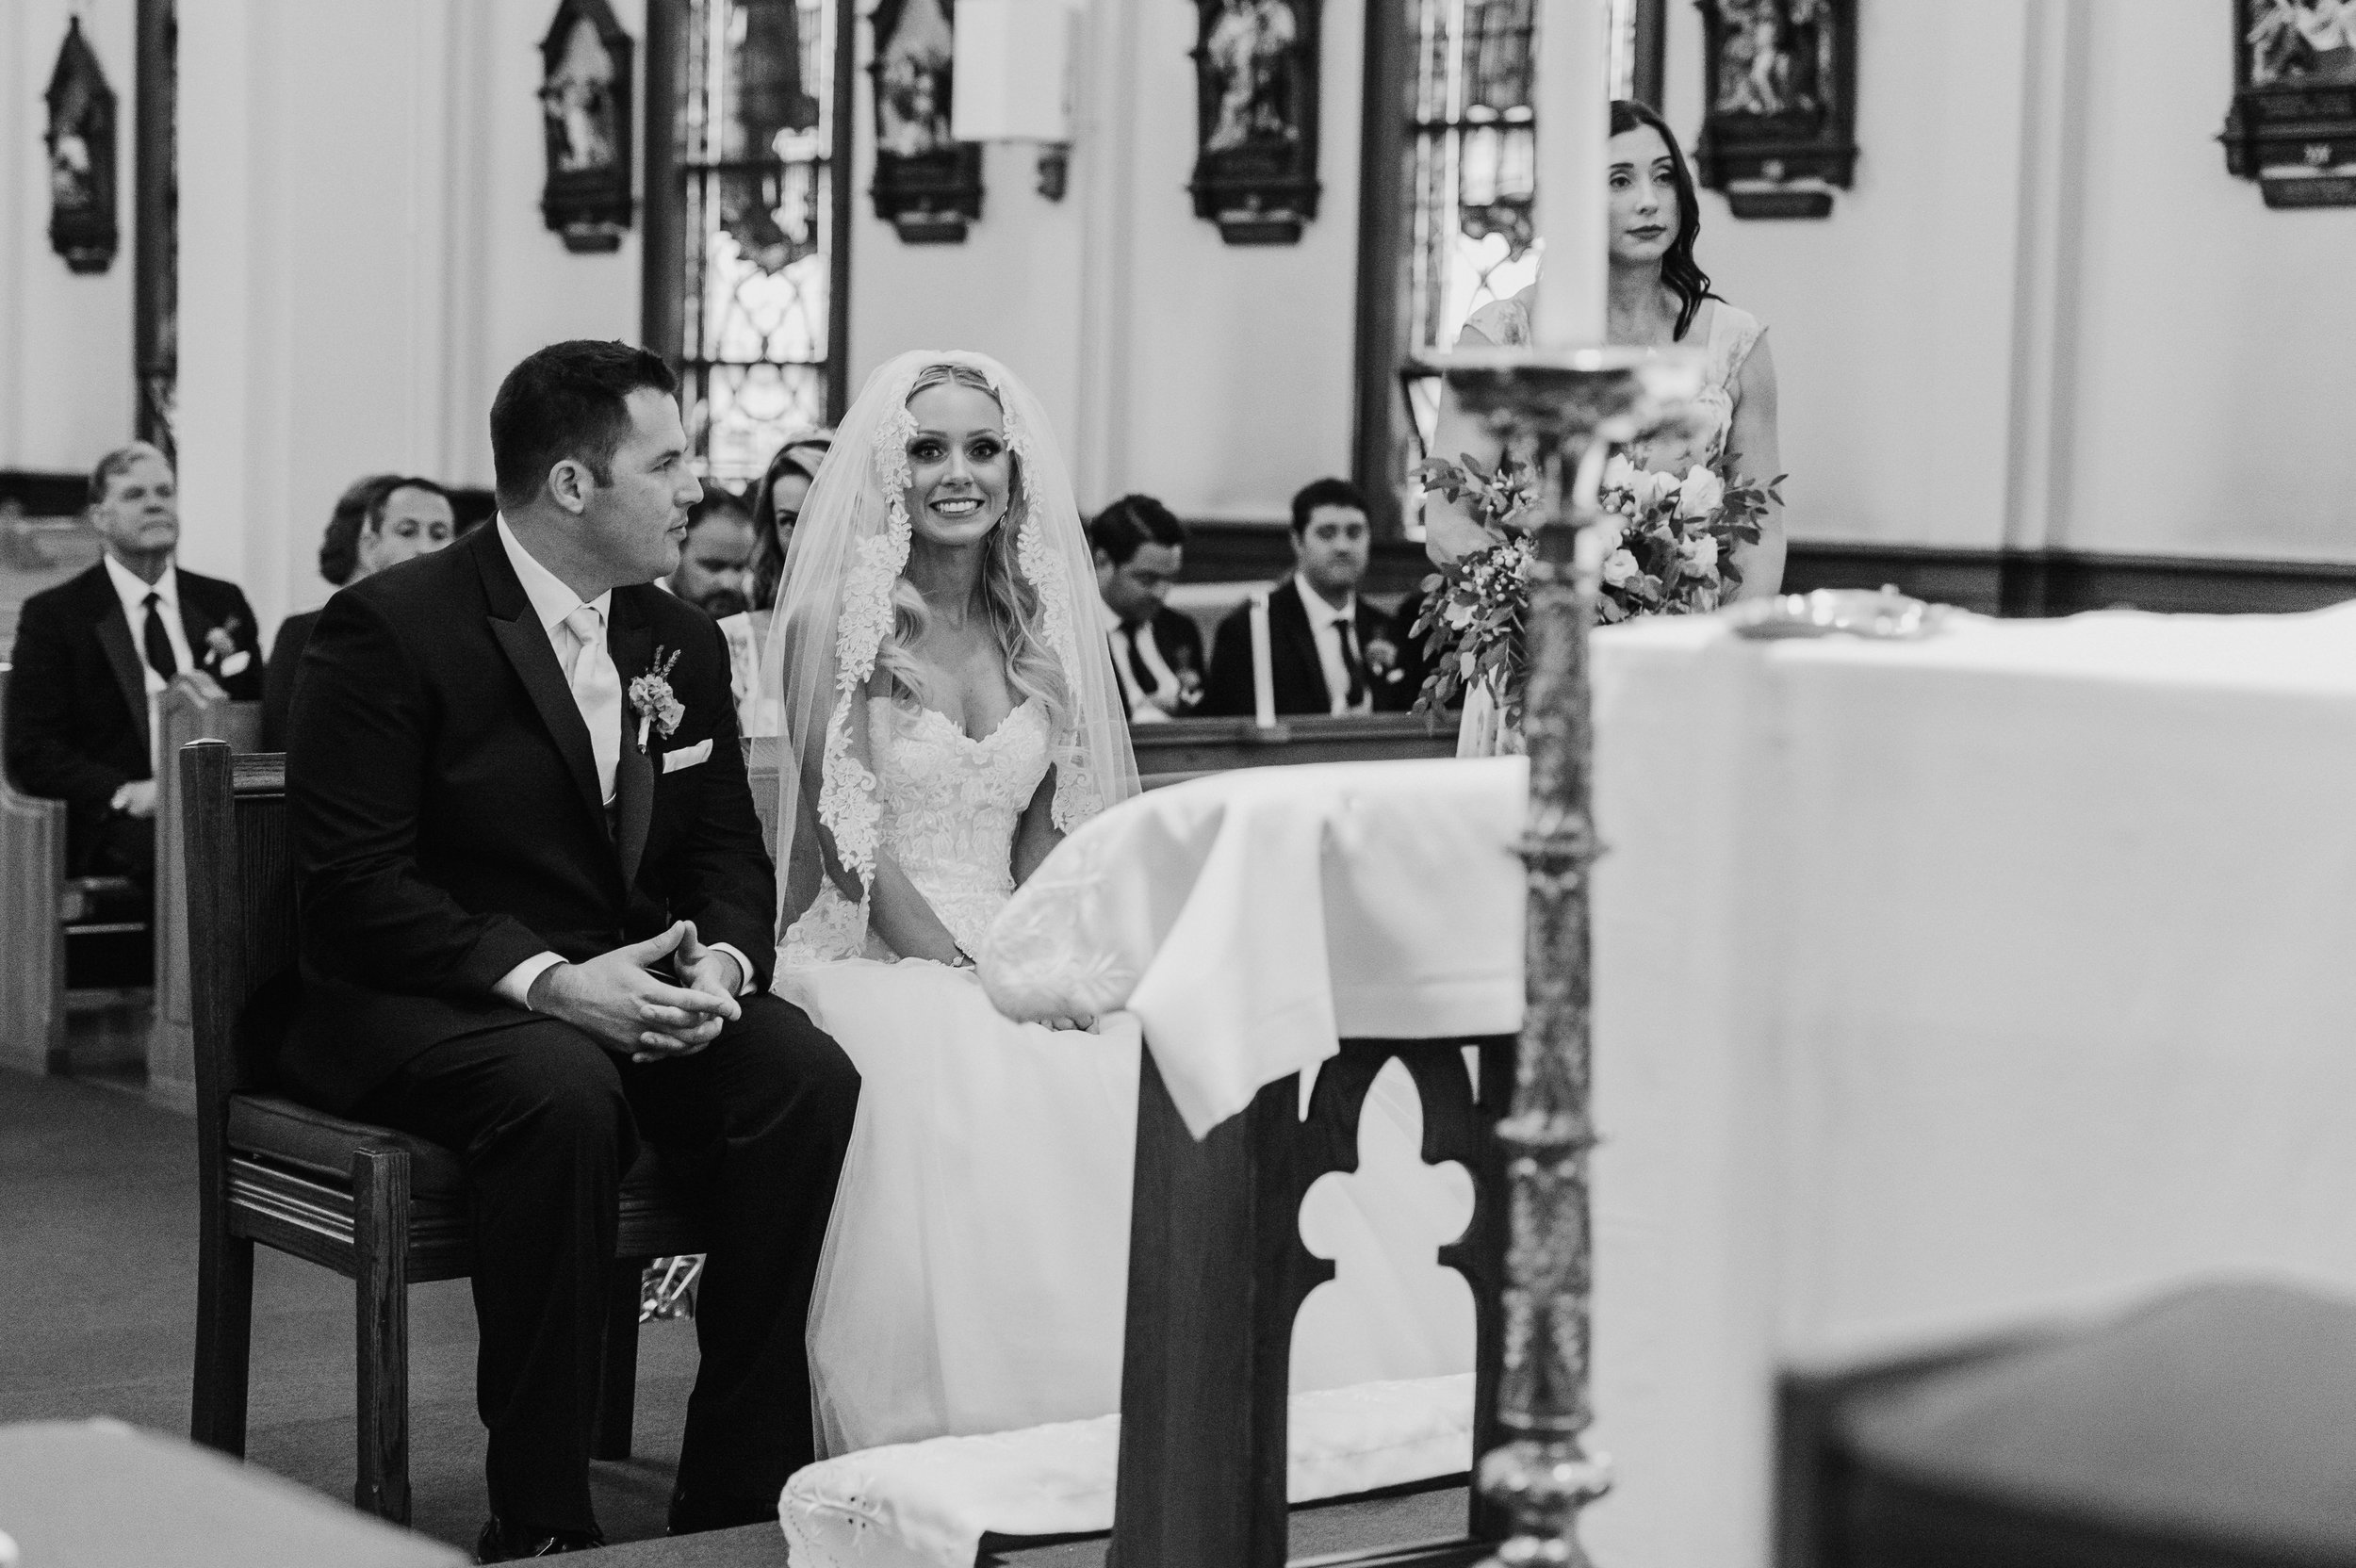 Christine-and-James-Wedding_-112_B&W.jpg